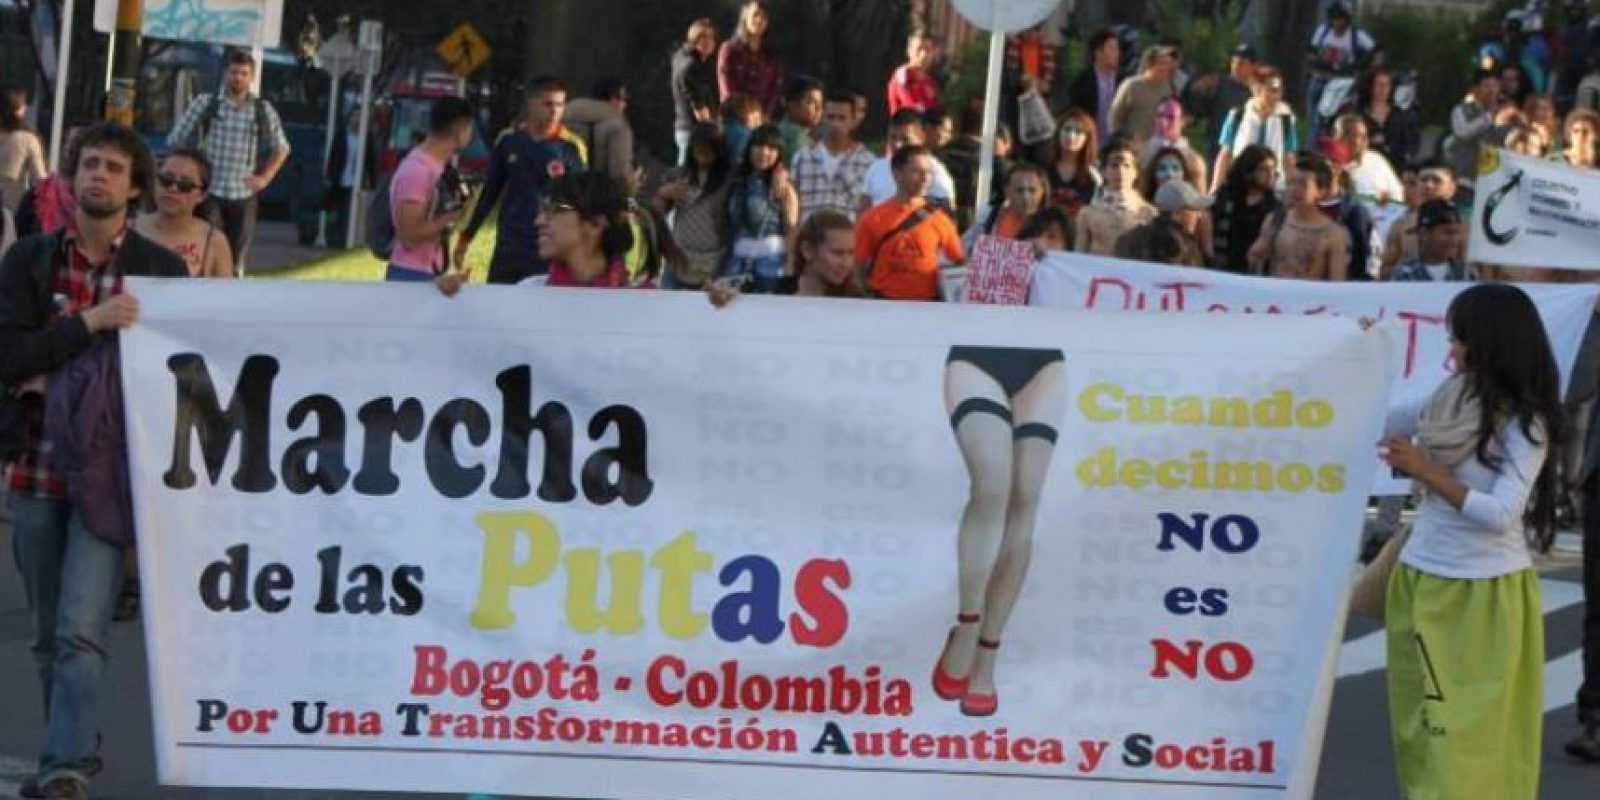 Foto:Archivo de marcha de la putas